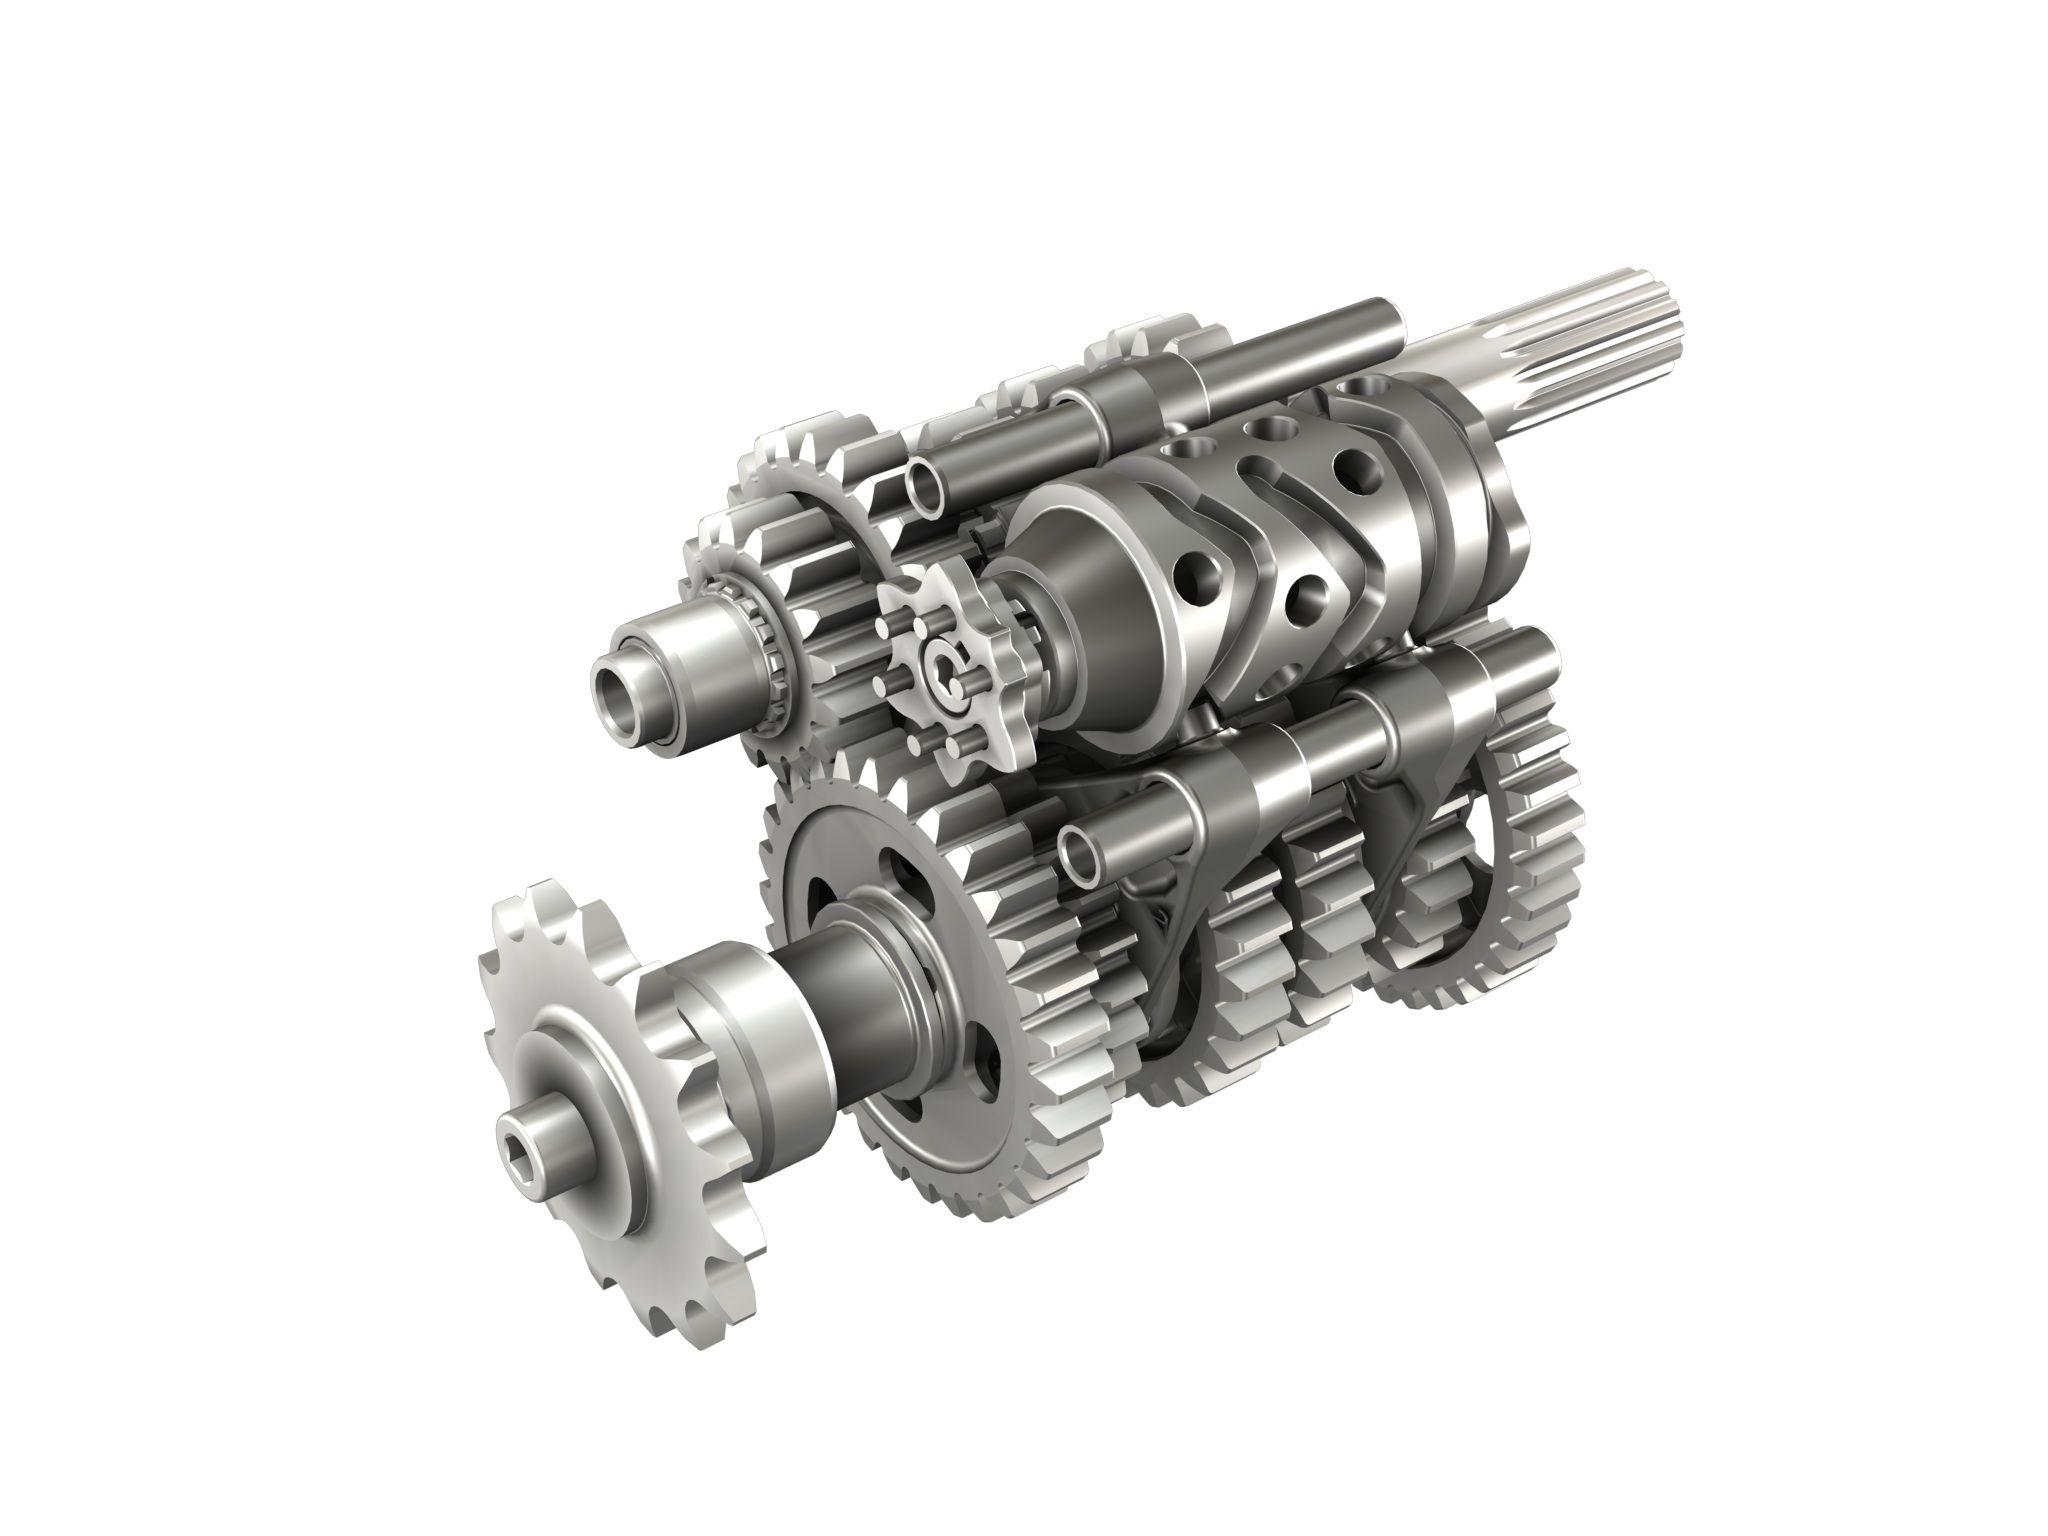 1199 Panigale gearbox | Ducati Design | Ducati, Gas turbine